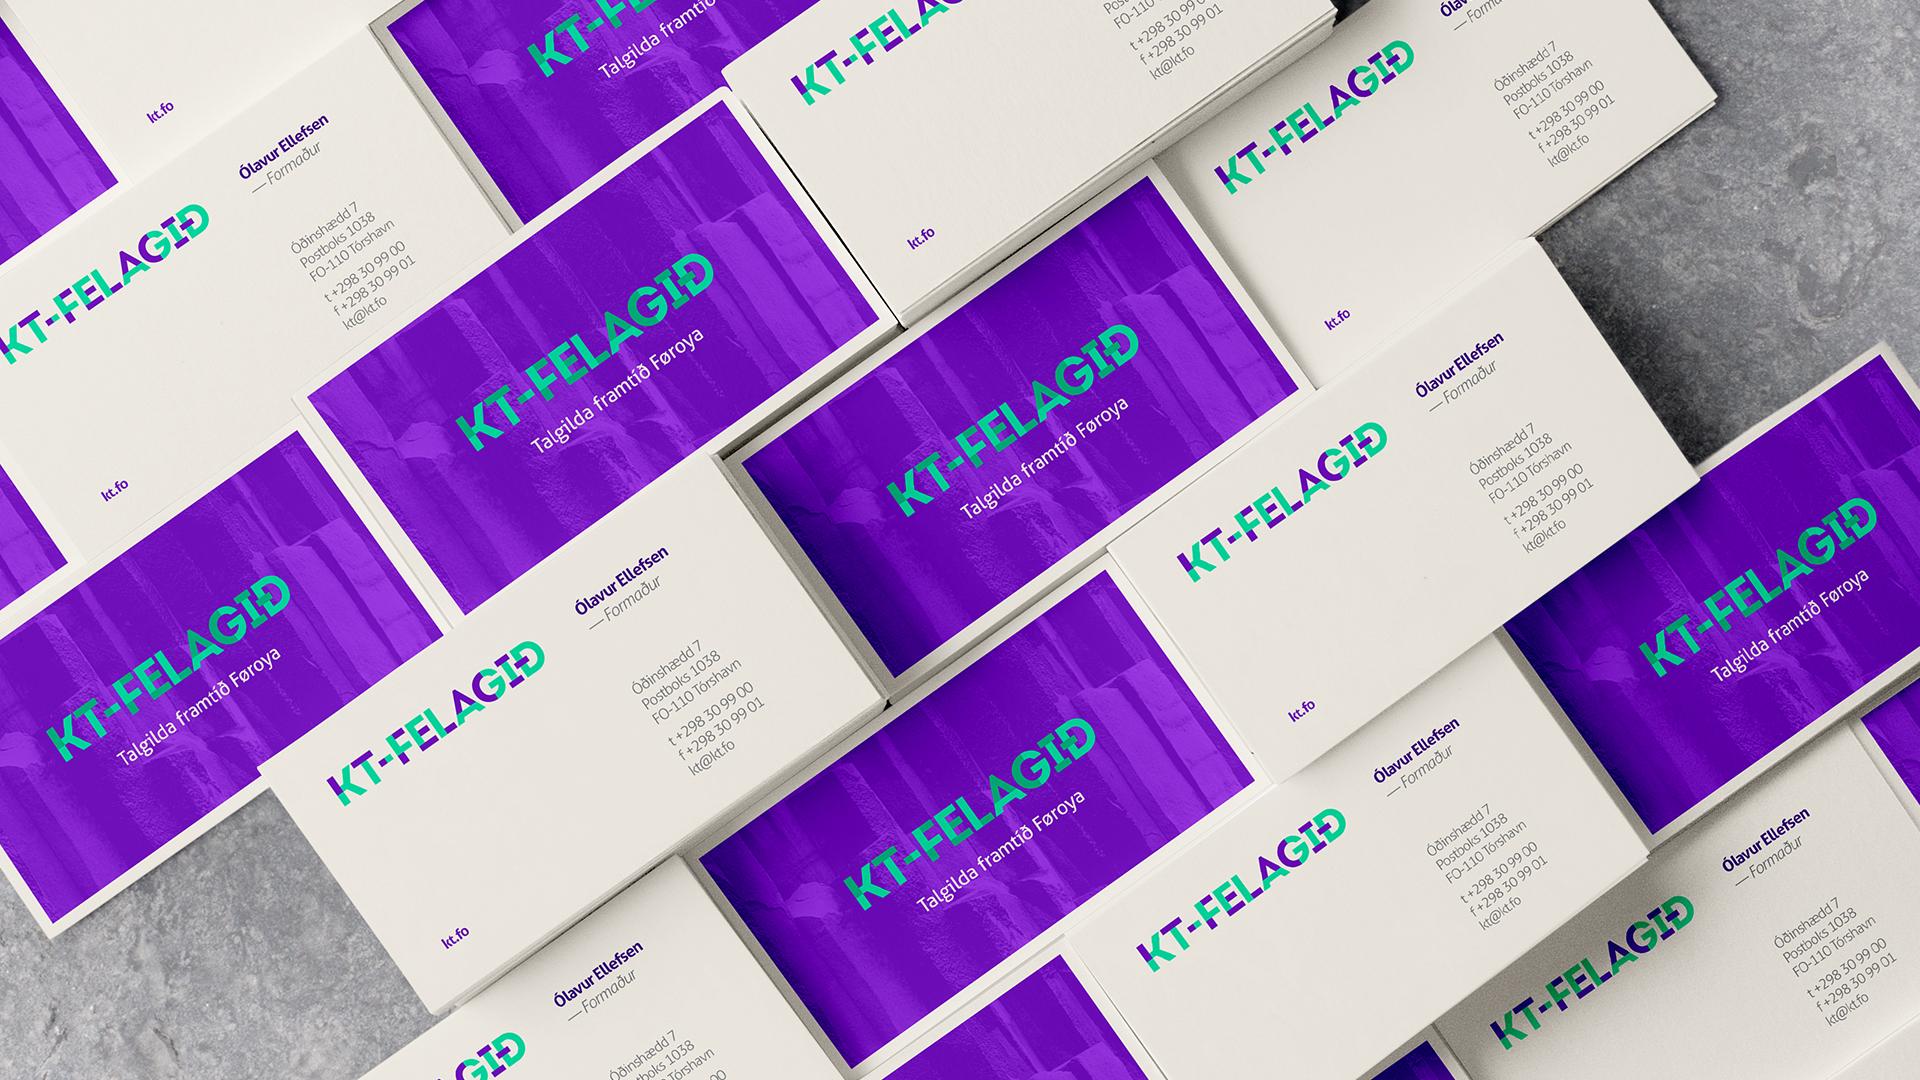 KT-Felagid_Business_Card_Mock-up_16.9.jpg